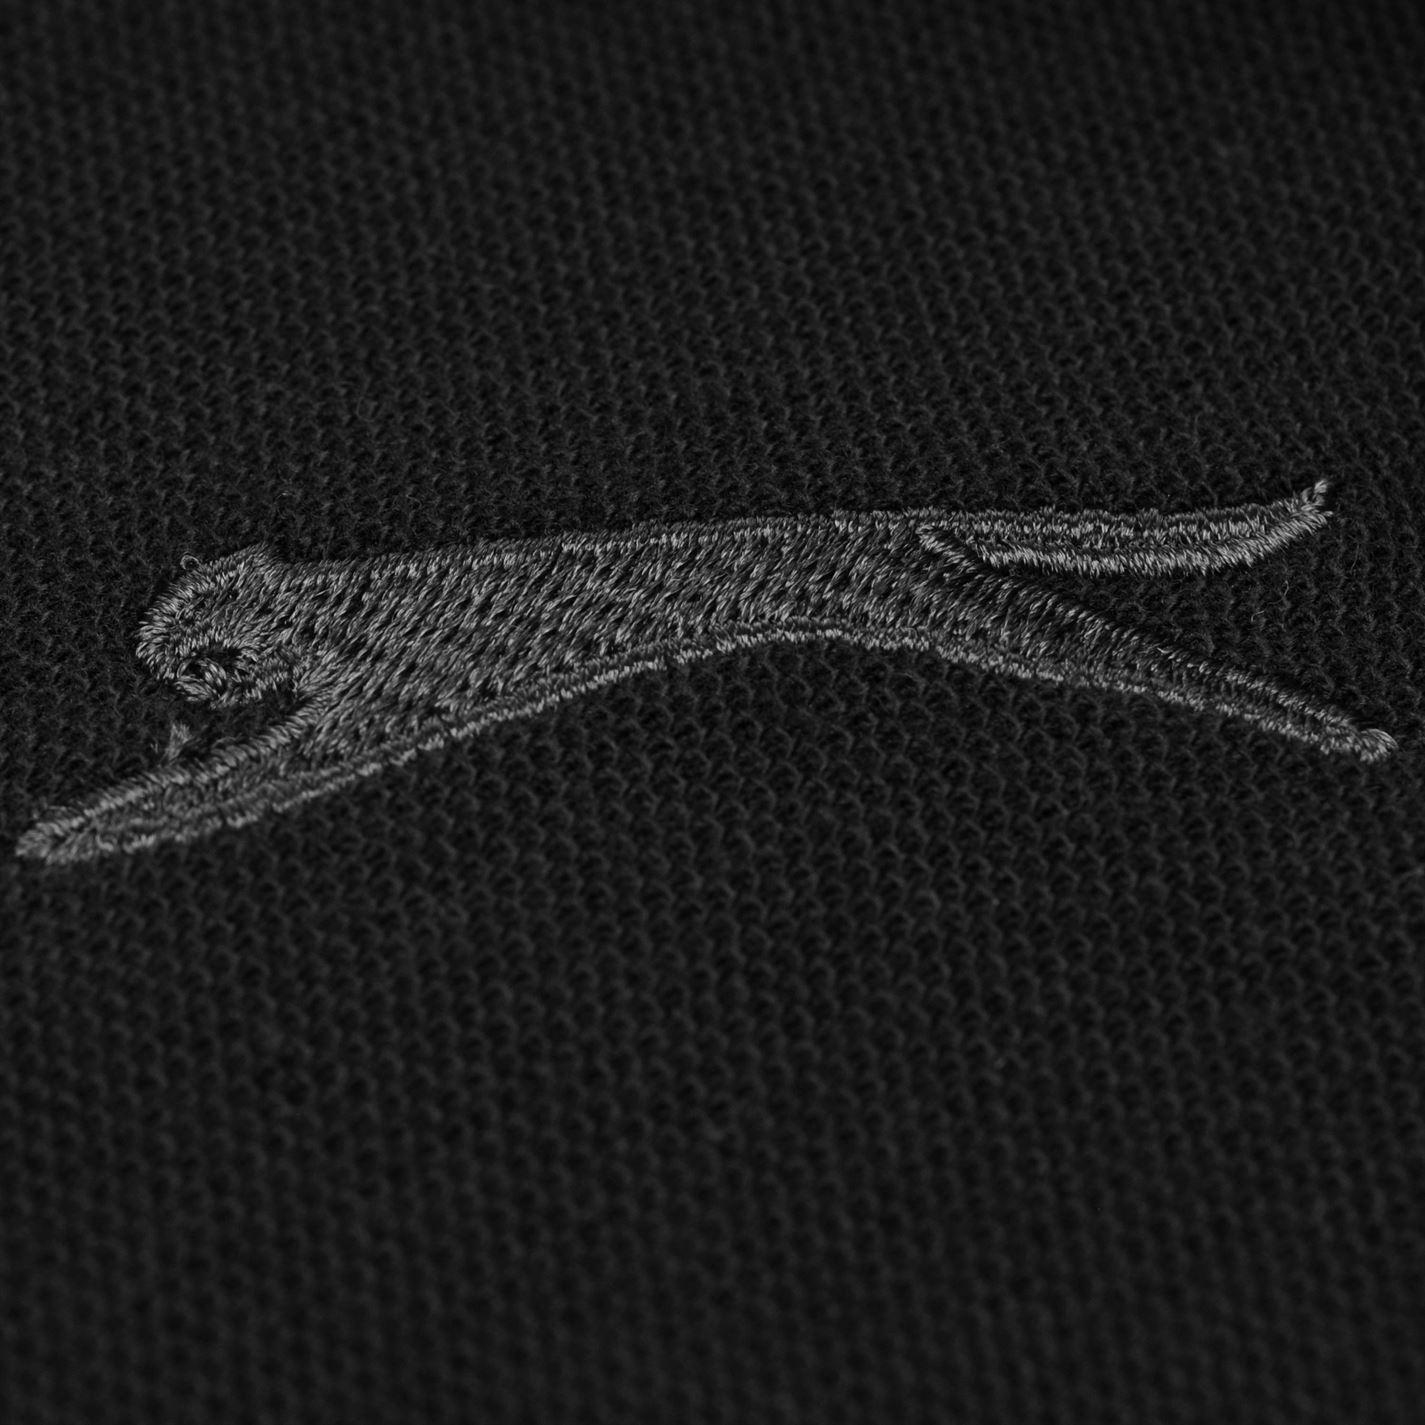 Tricouri Polo Slazenger Tipped pentru Barbati negru